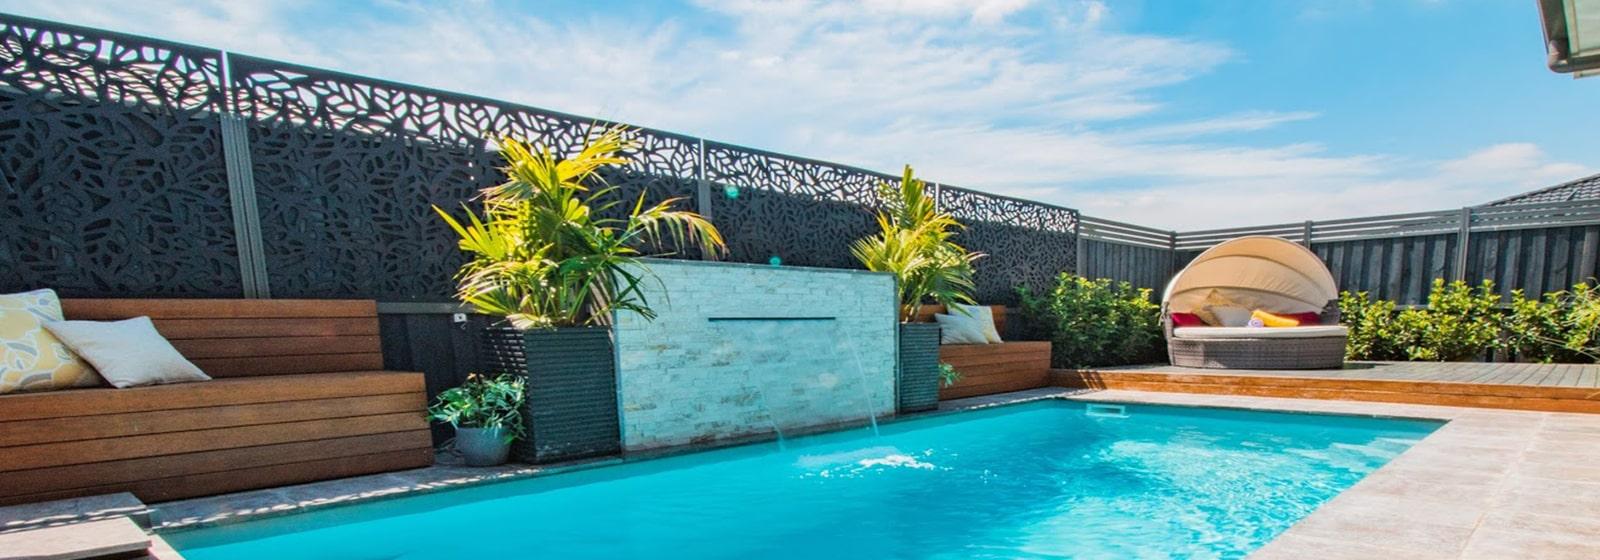 Pool Installation Brisbane